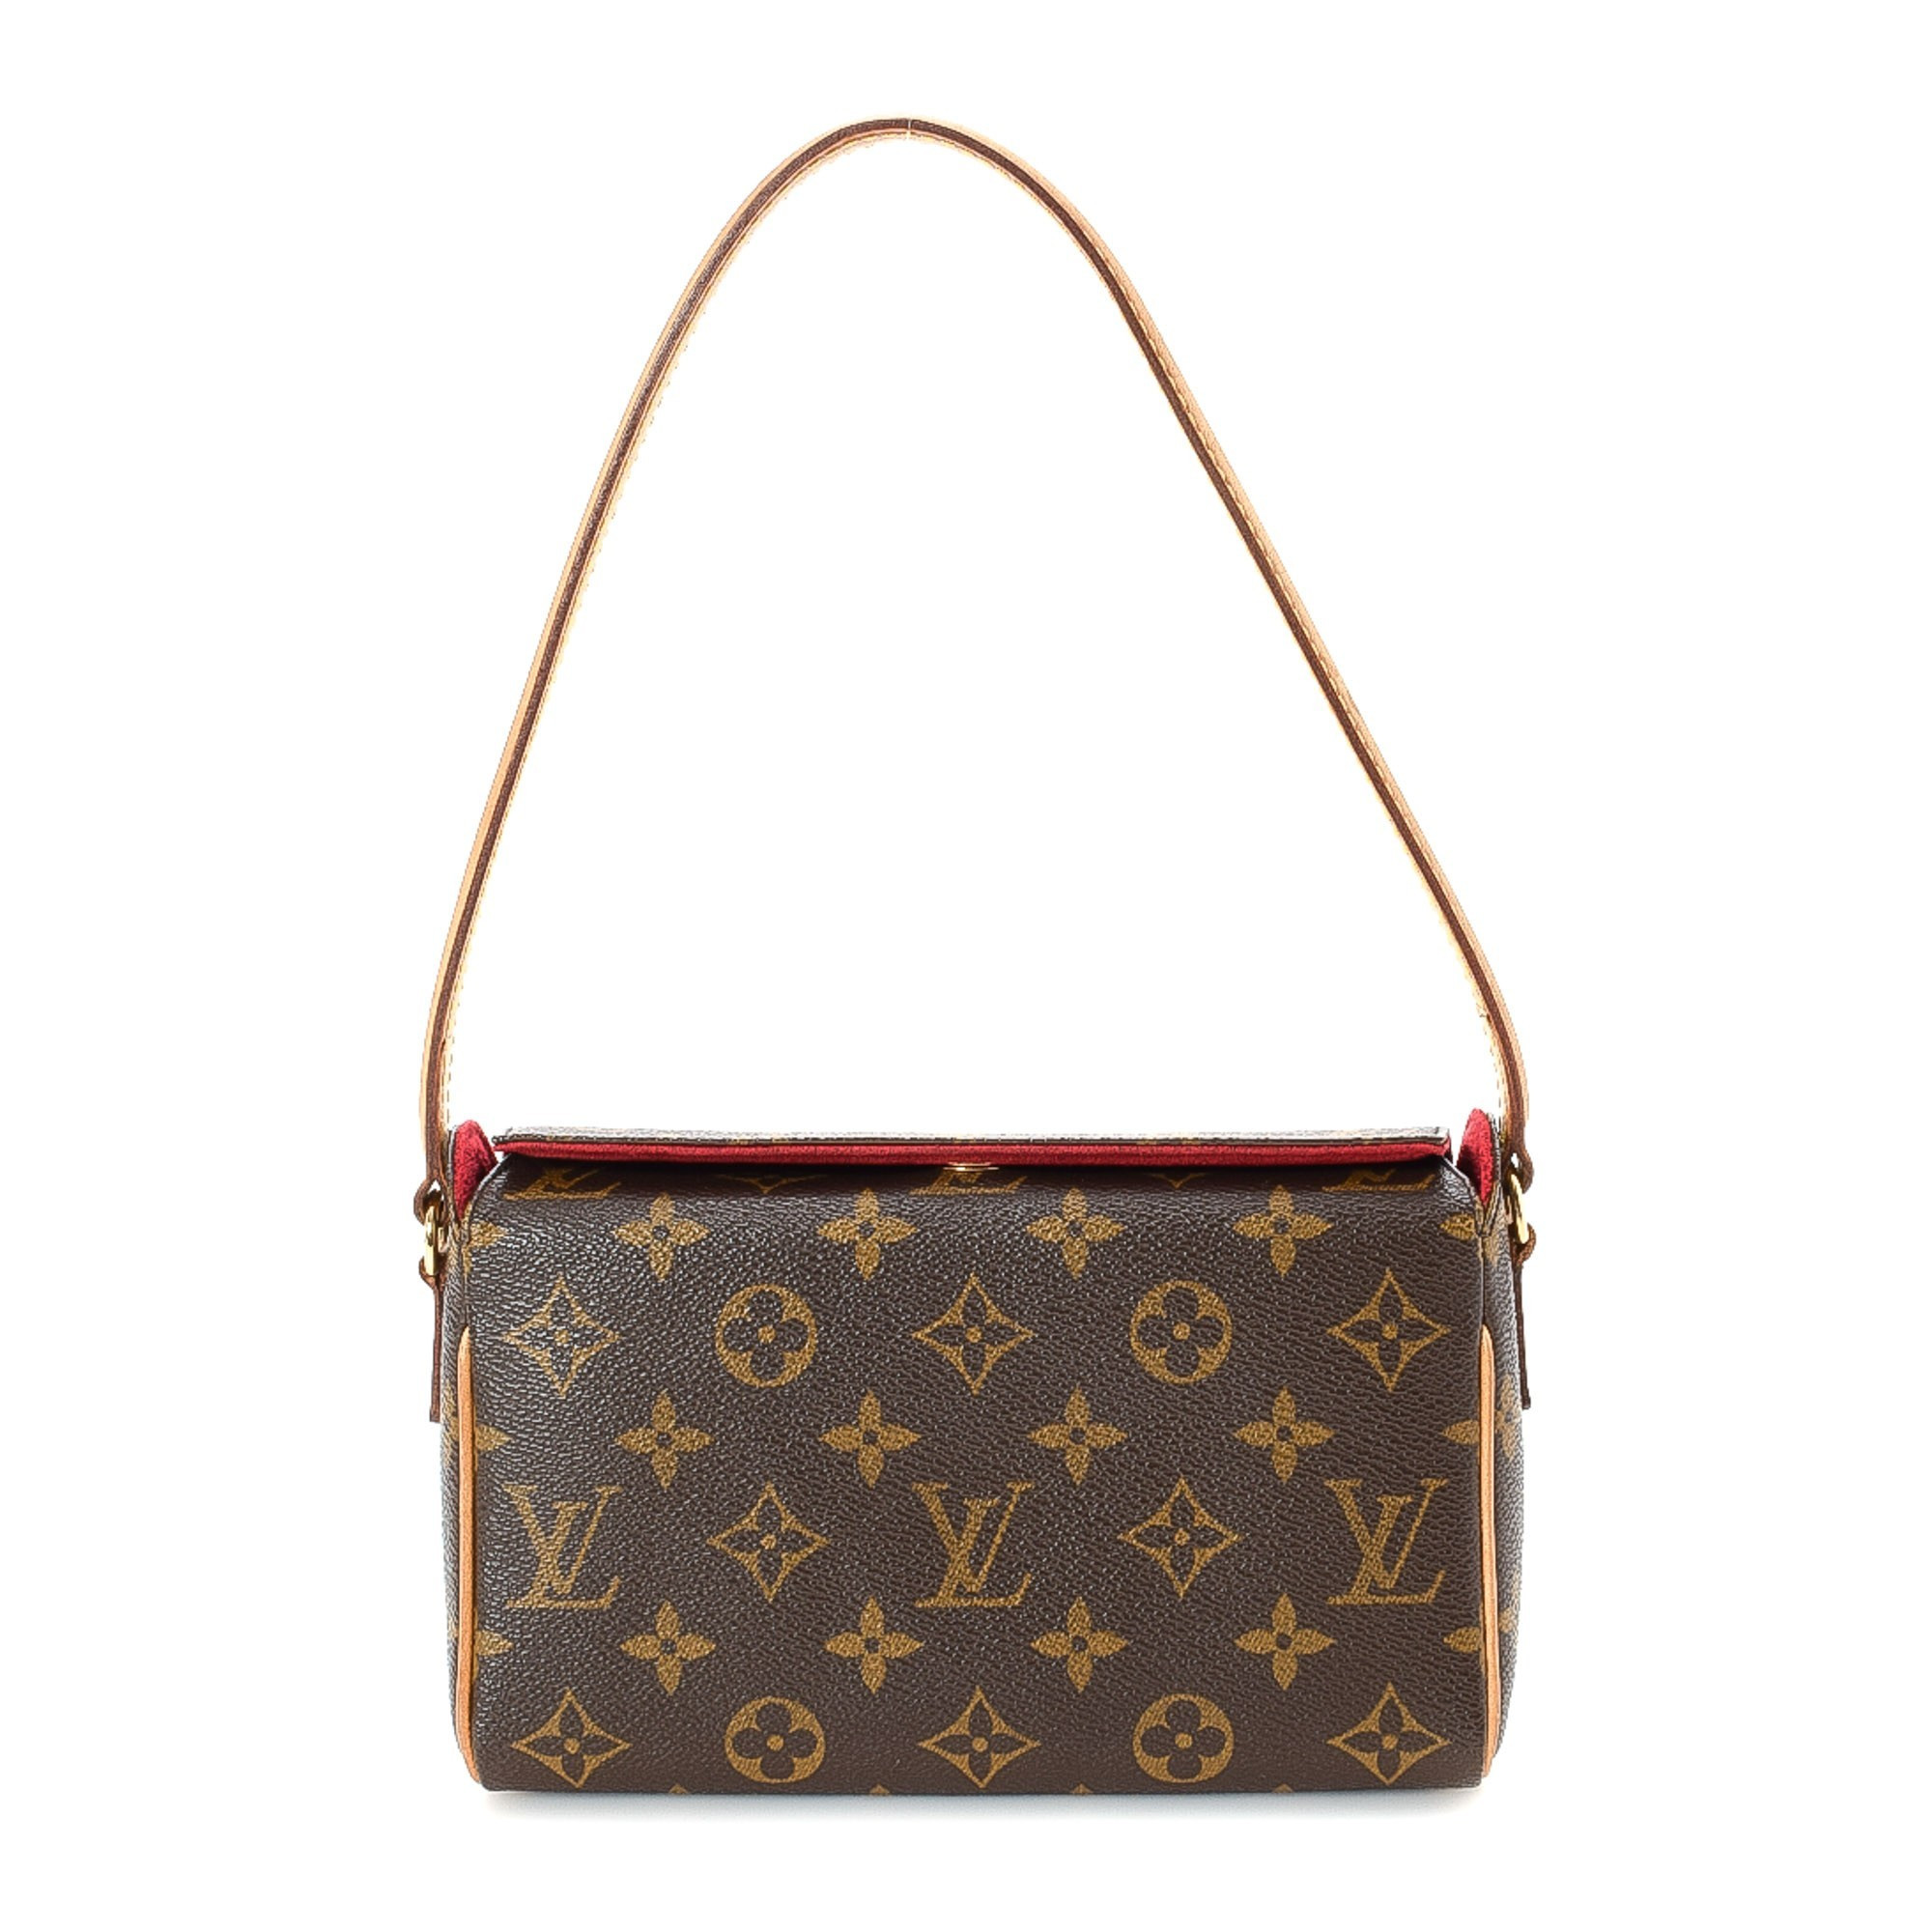 Louis Vuitton Recital Monogram Brown Coated Canvas Shoulder Bag LXRCO